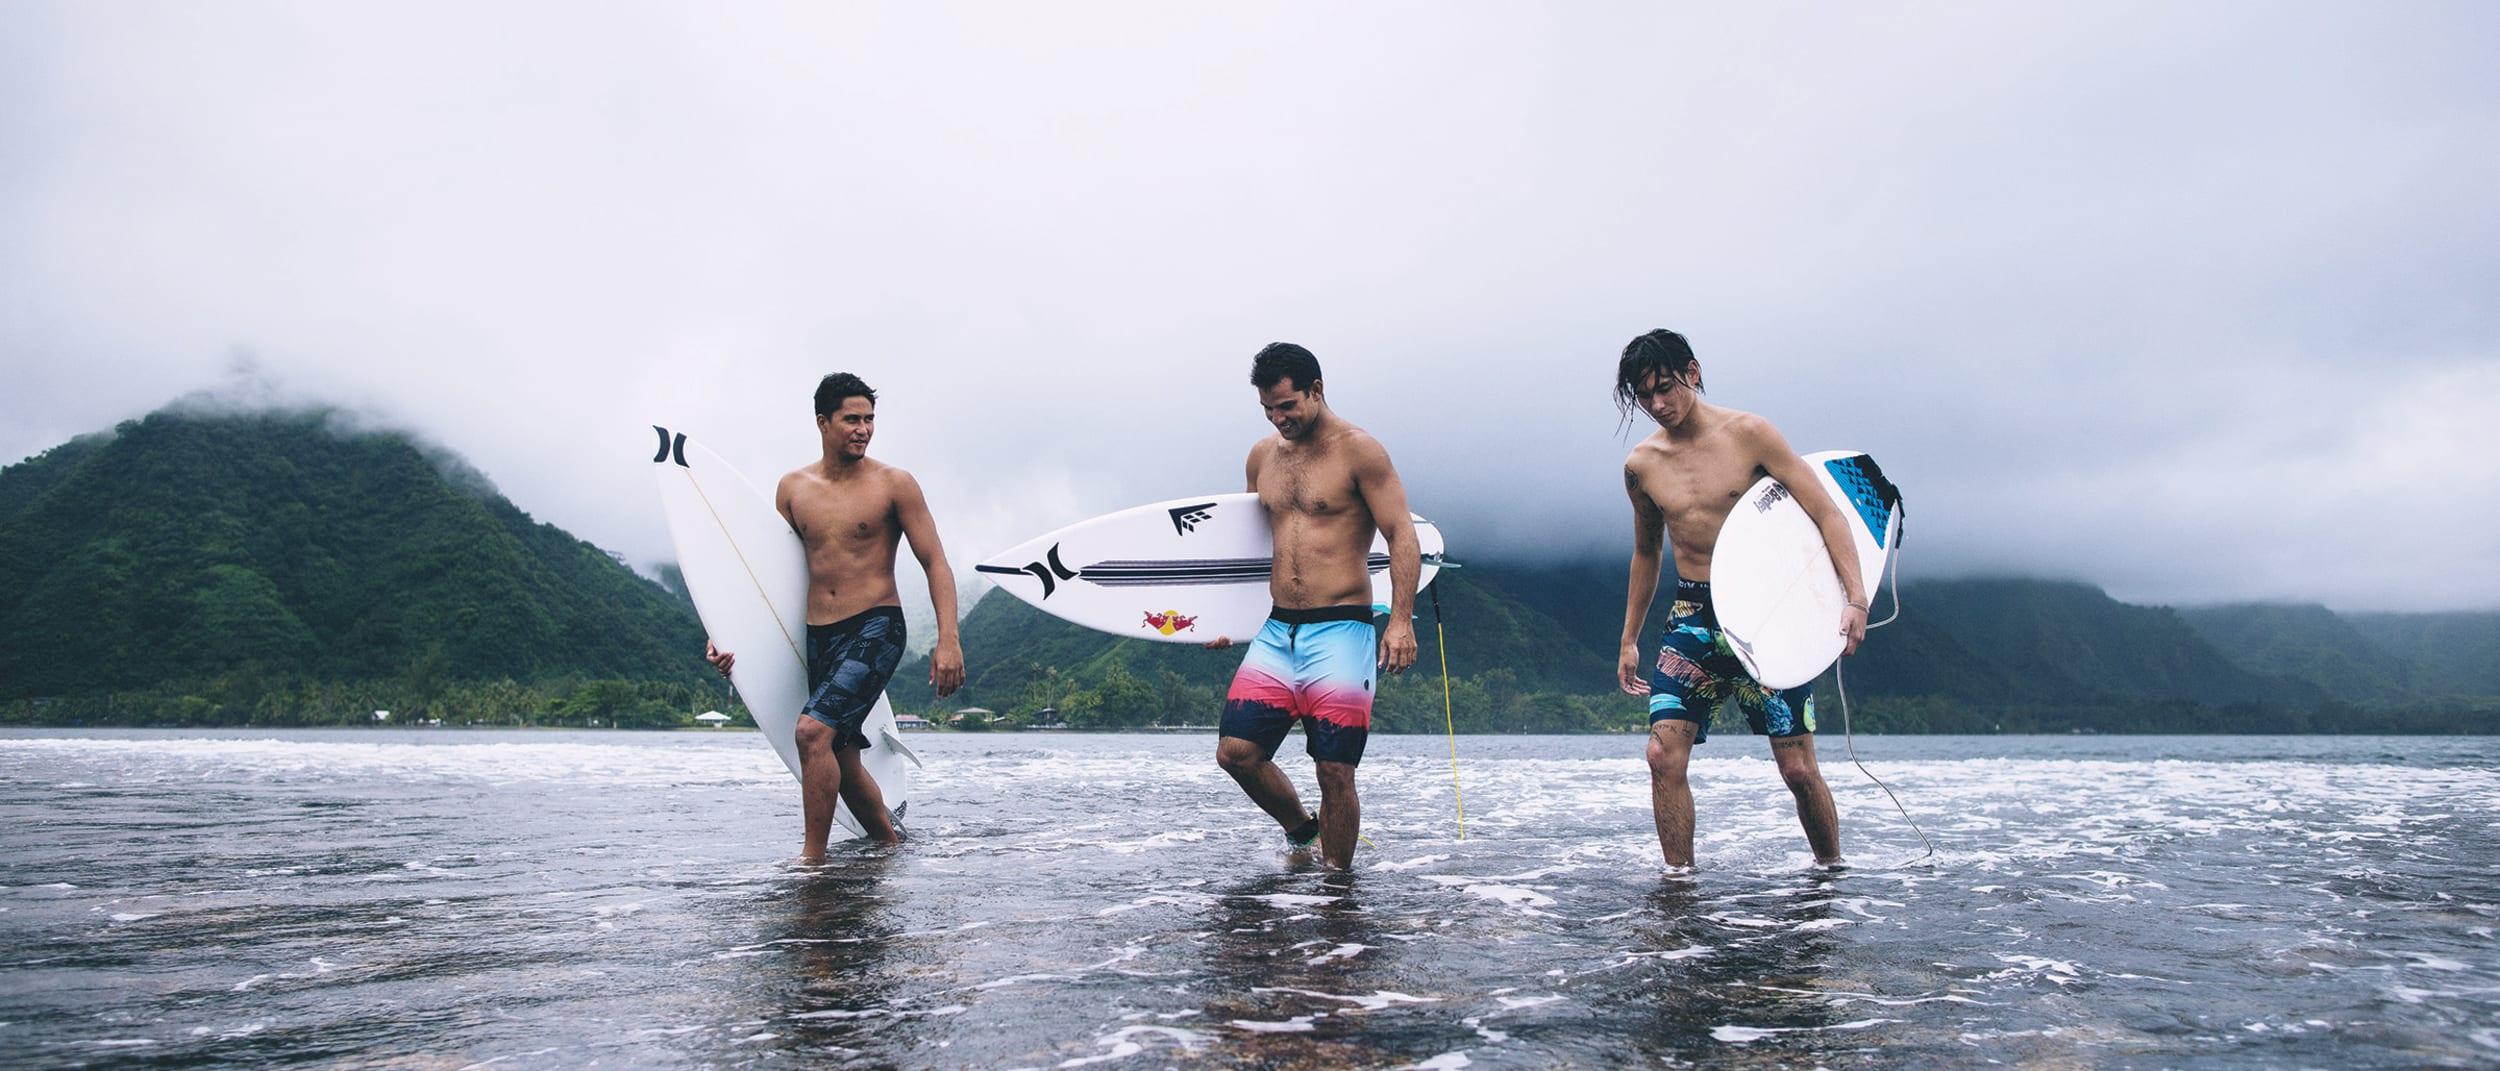 Fresh drop at Ozmosis: men's boardshorts